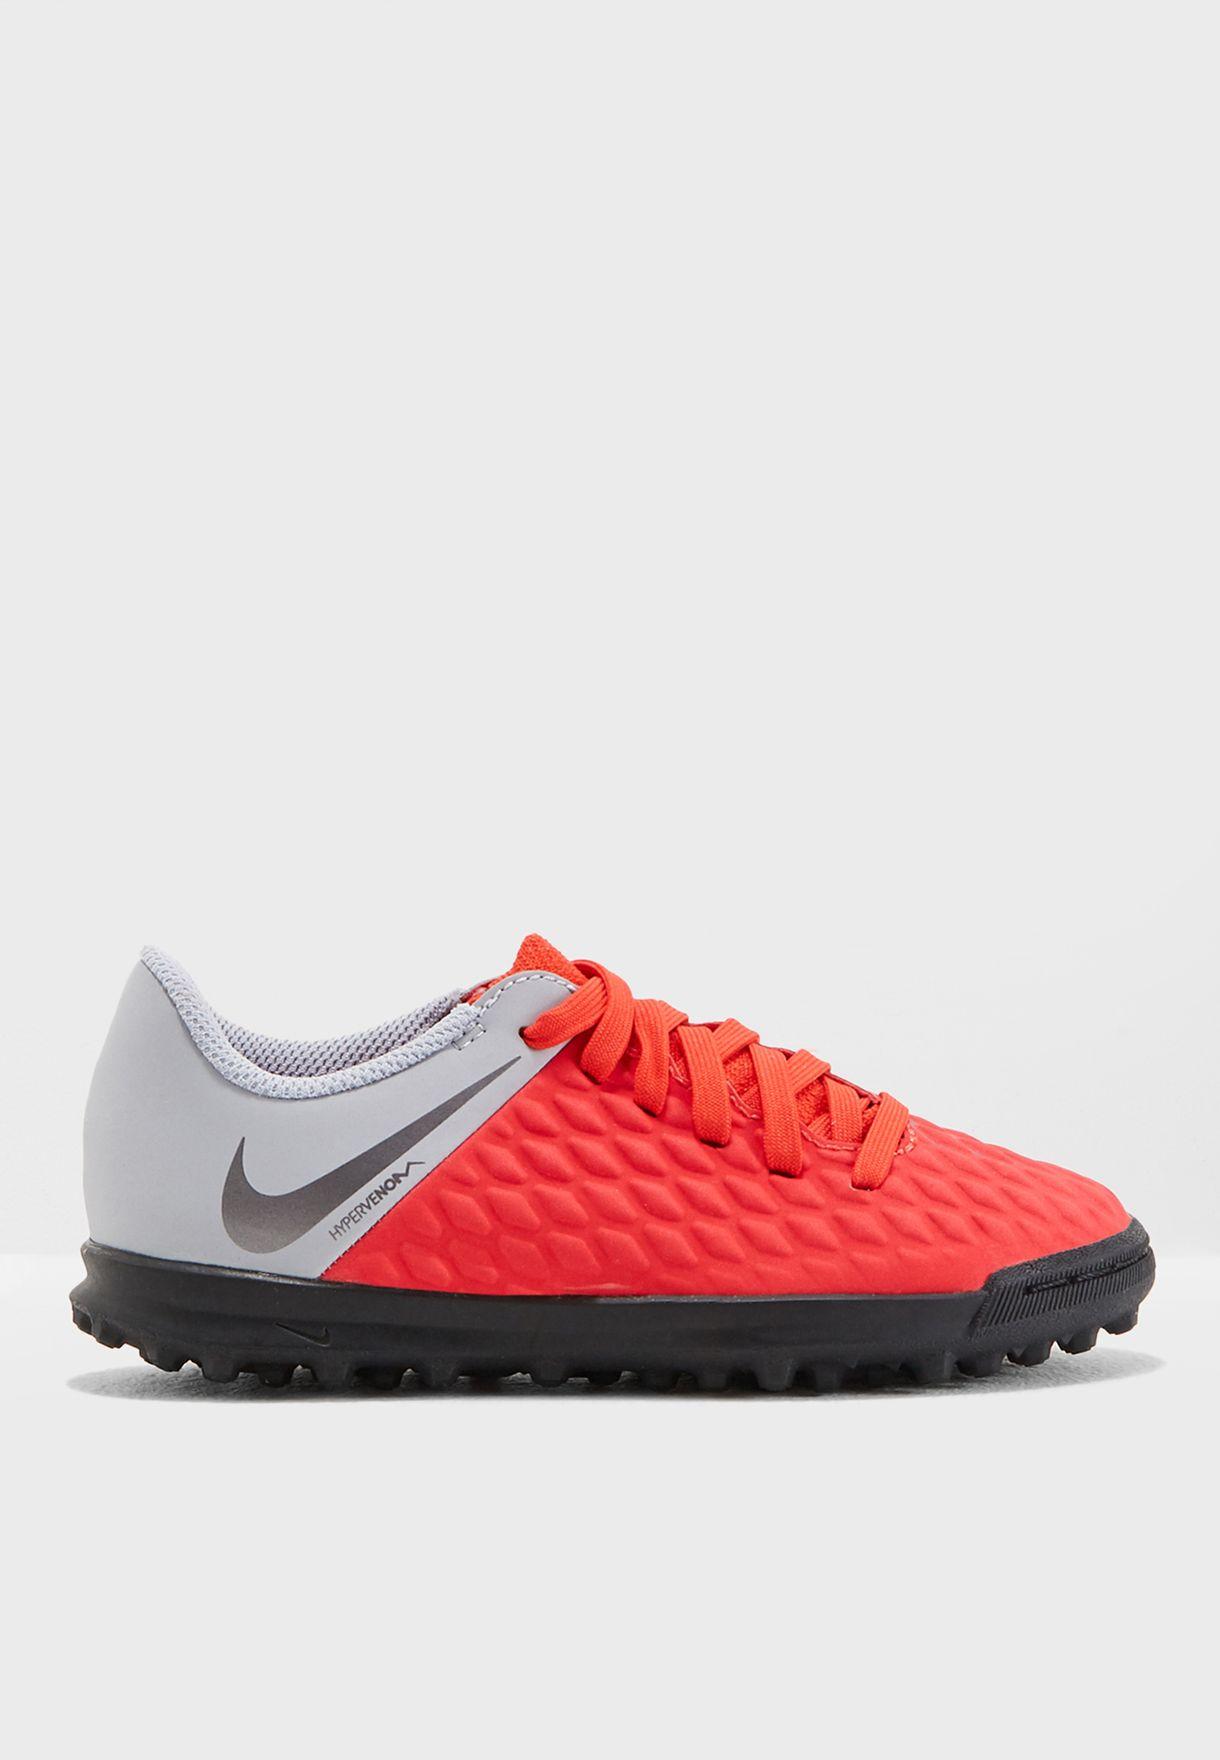 1c0bceec2 Shop Nike multicolor Youth Hypervenom Phantomx 3 Club TF AJ3790-600 ...